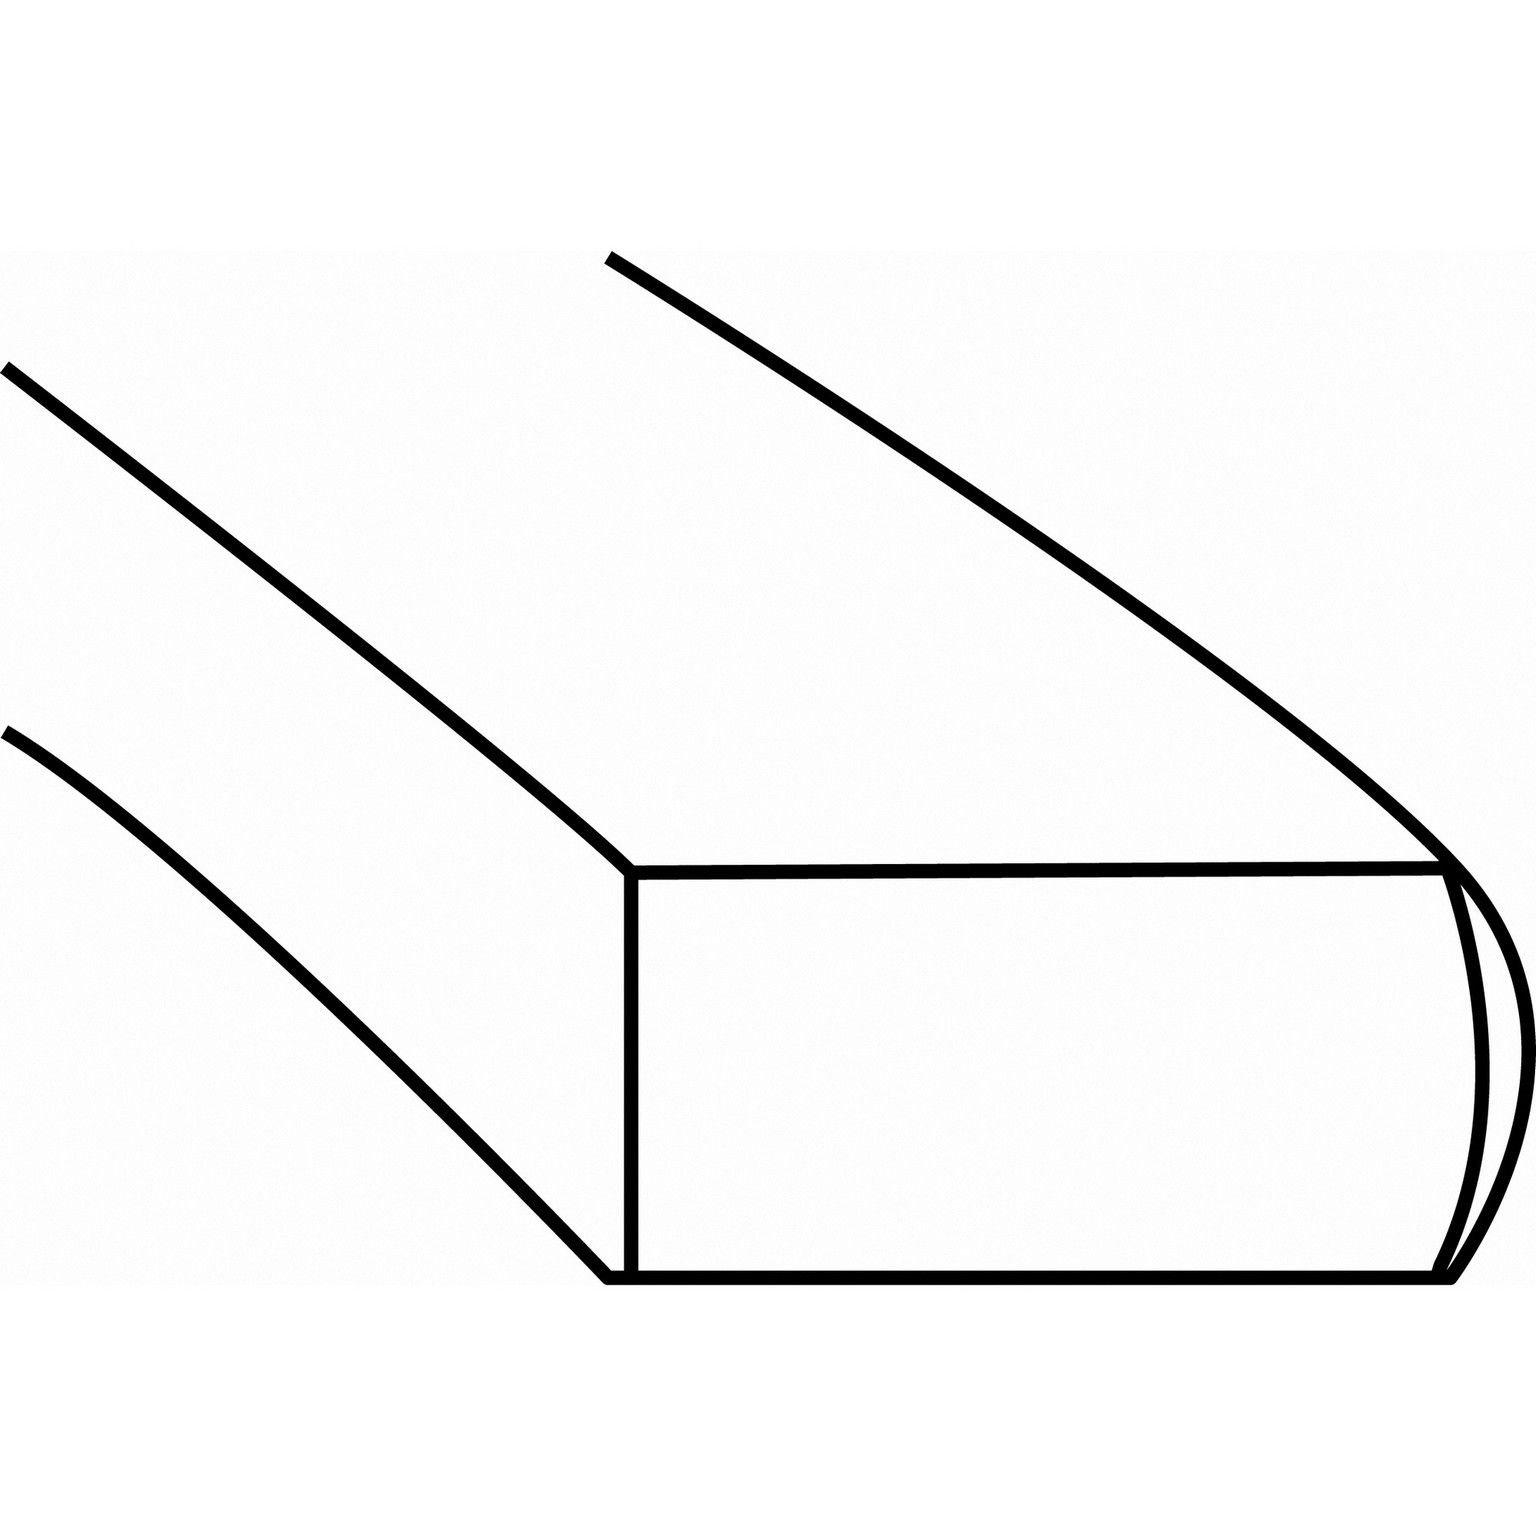 1989 Geo Metro Engine Piston Ring Set 3 Cyl 1.0L (Sealed Power E-549KC)  Type: Premium Piston Ring Set 1-1.20MM, 1-1.50MM, 1-2.80MM Premium Chrome  Standard ...